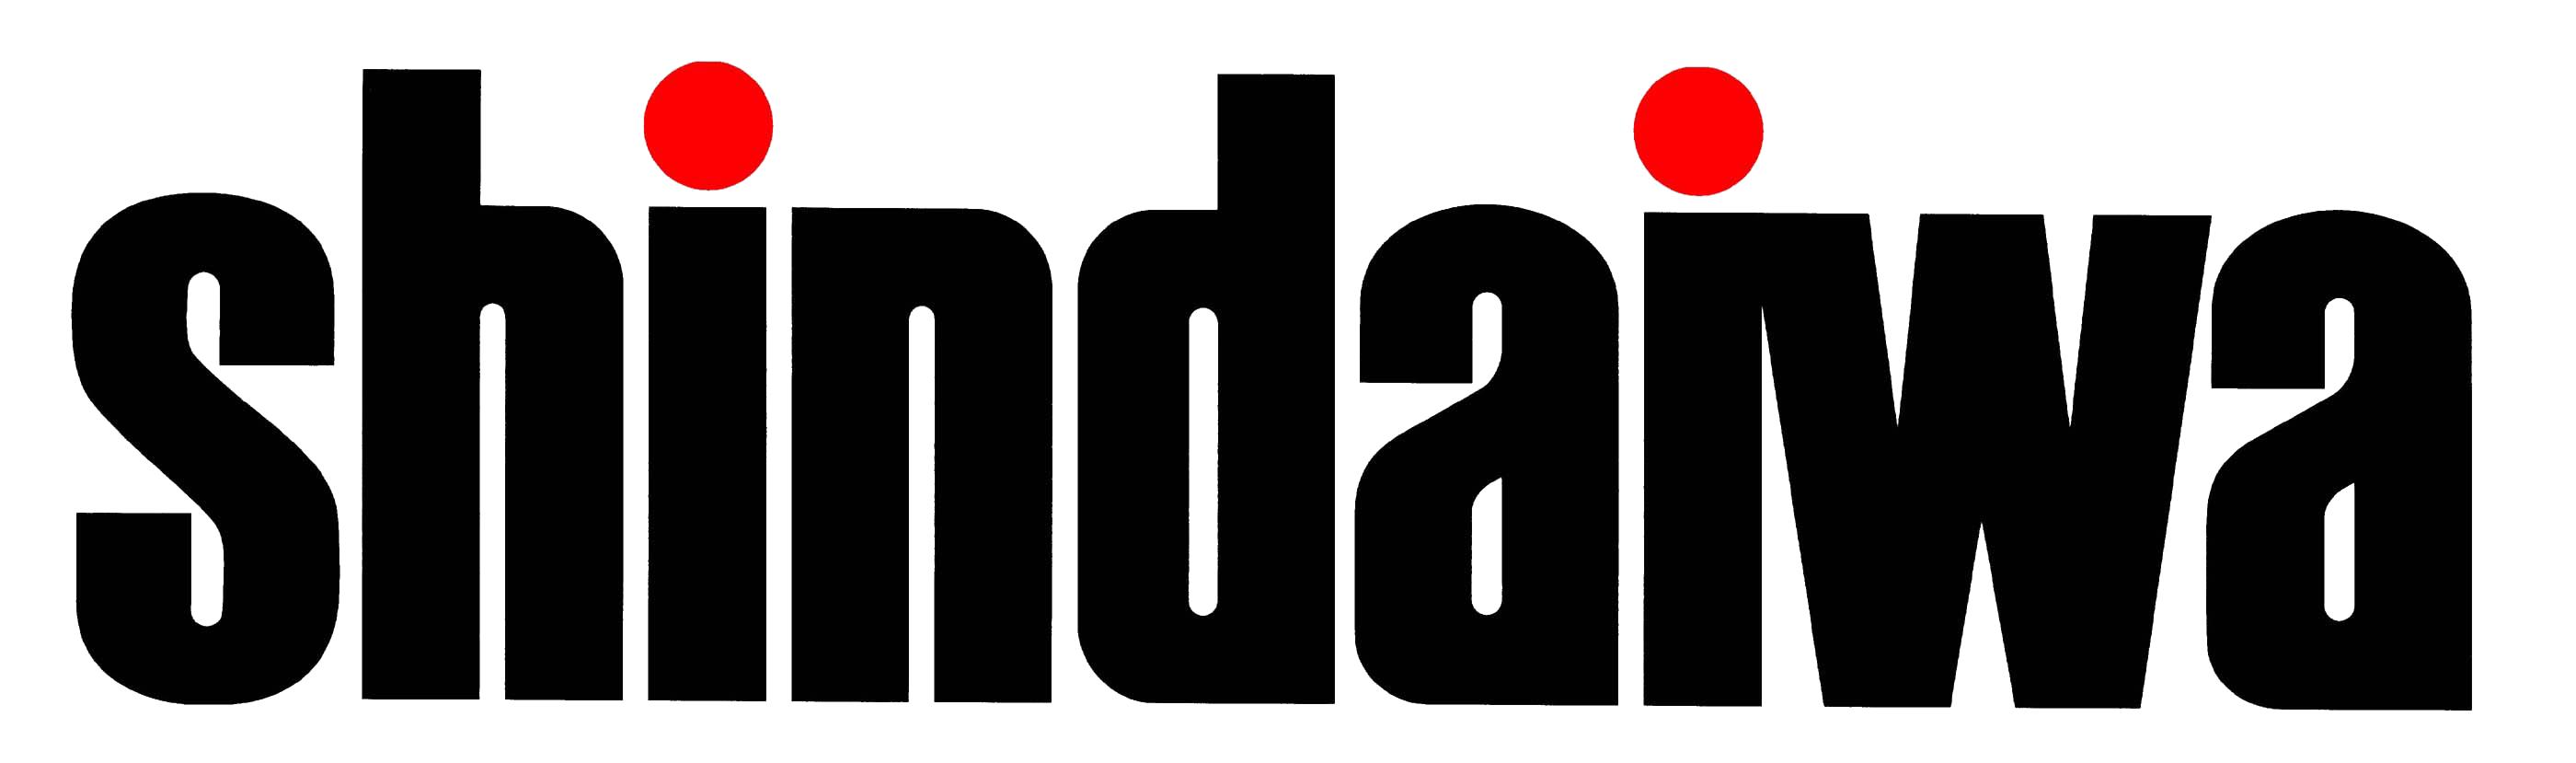 honda power equipment logo vector. honda power equipment logo vector